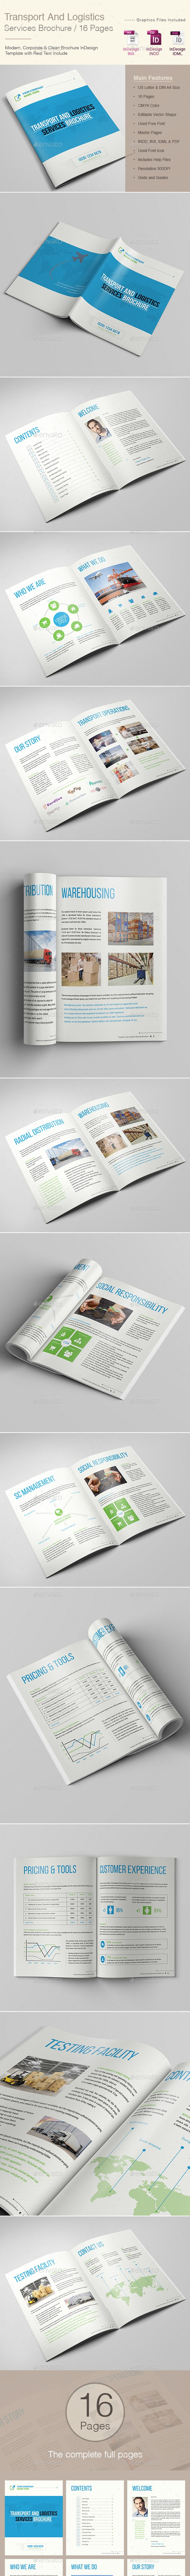 Transport And Logistics Services Brochure - Corporate Brochures